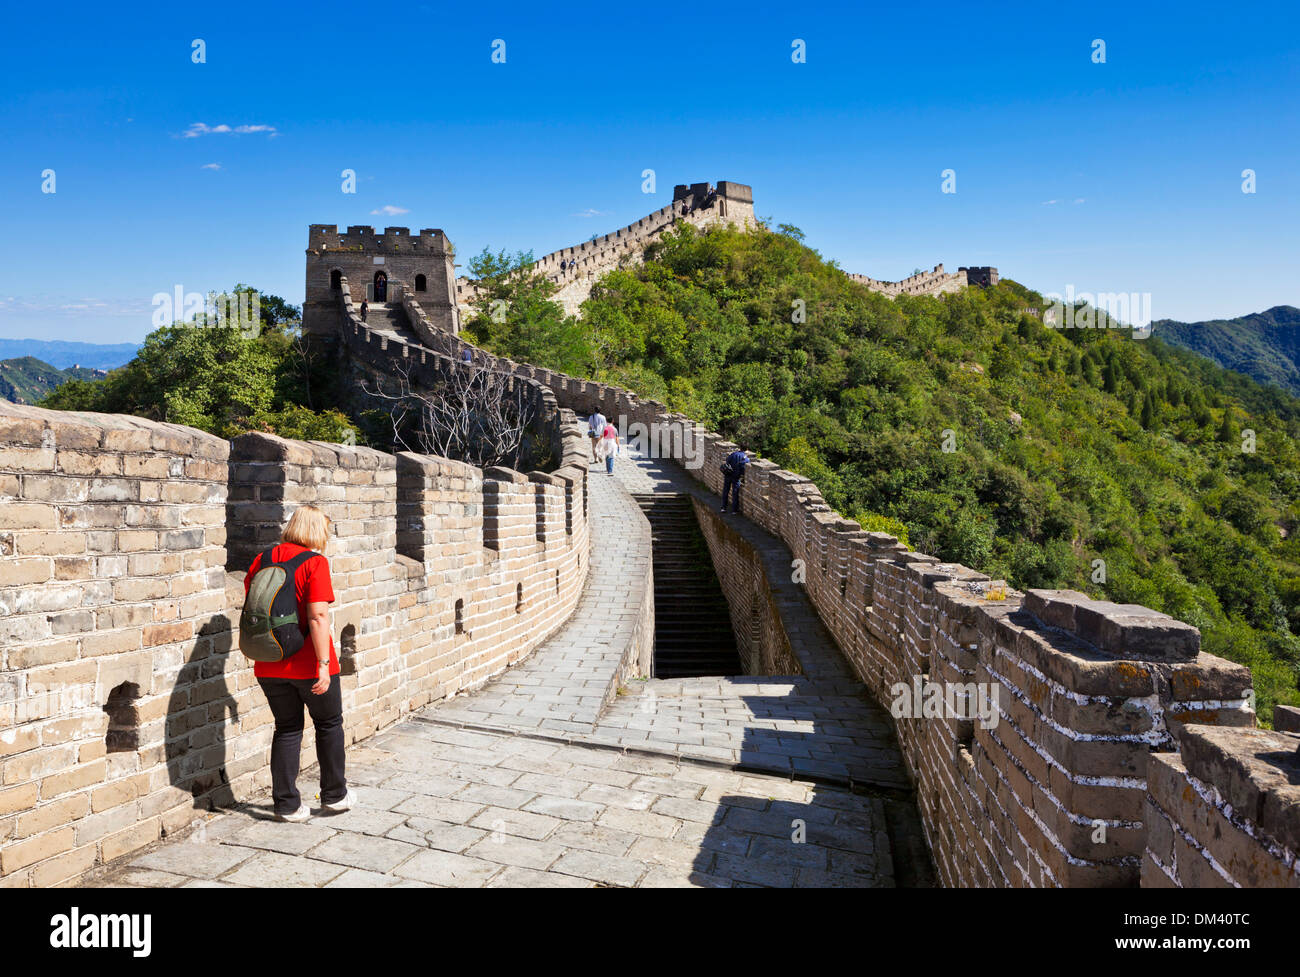 Woman Tourist walking on the Great Wall of China, UNESCO World Heritage Site, Mutianyu, Beijing District, China, - Stock Image